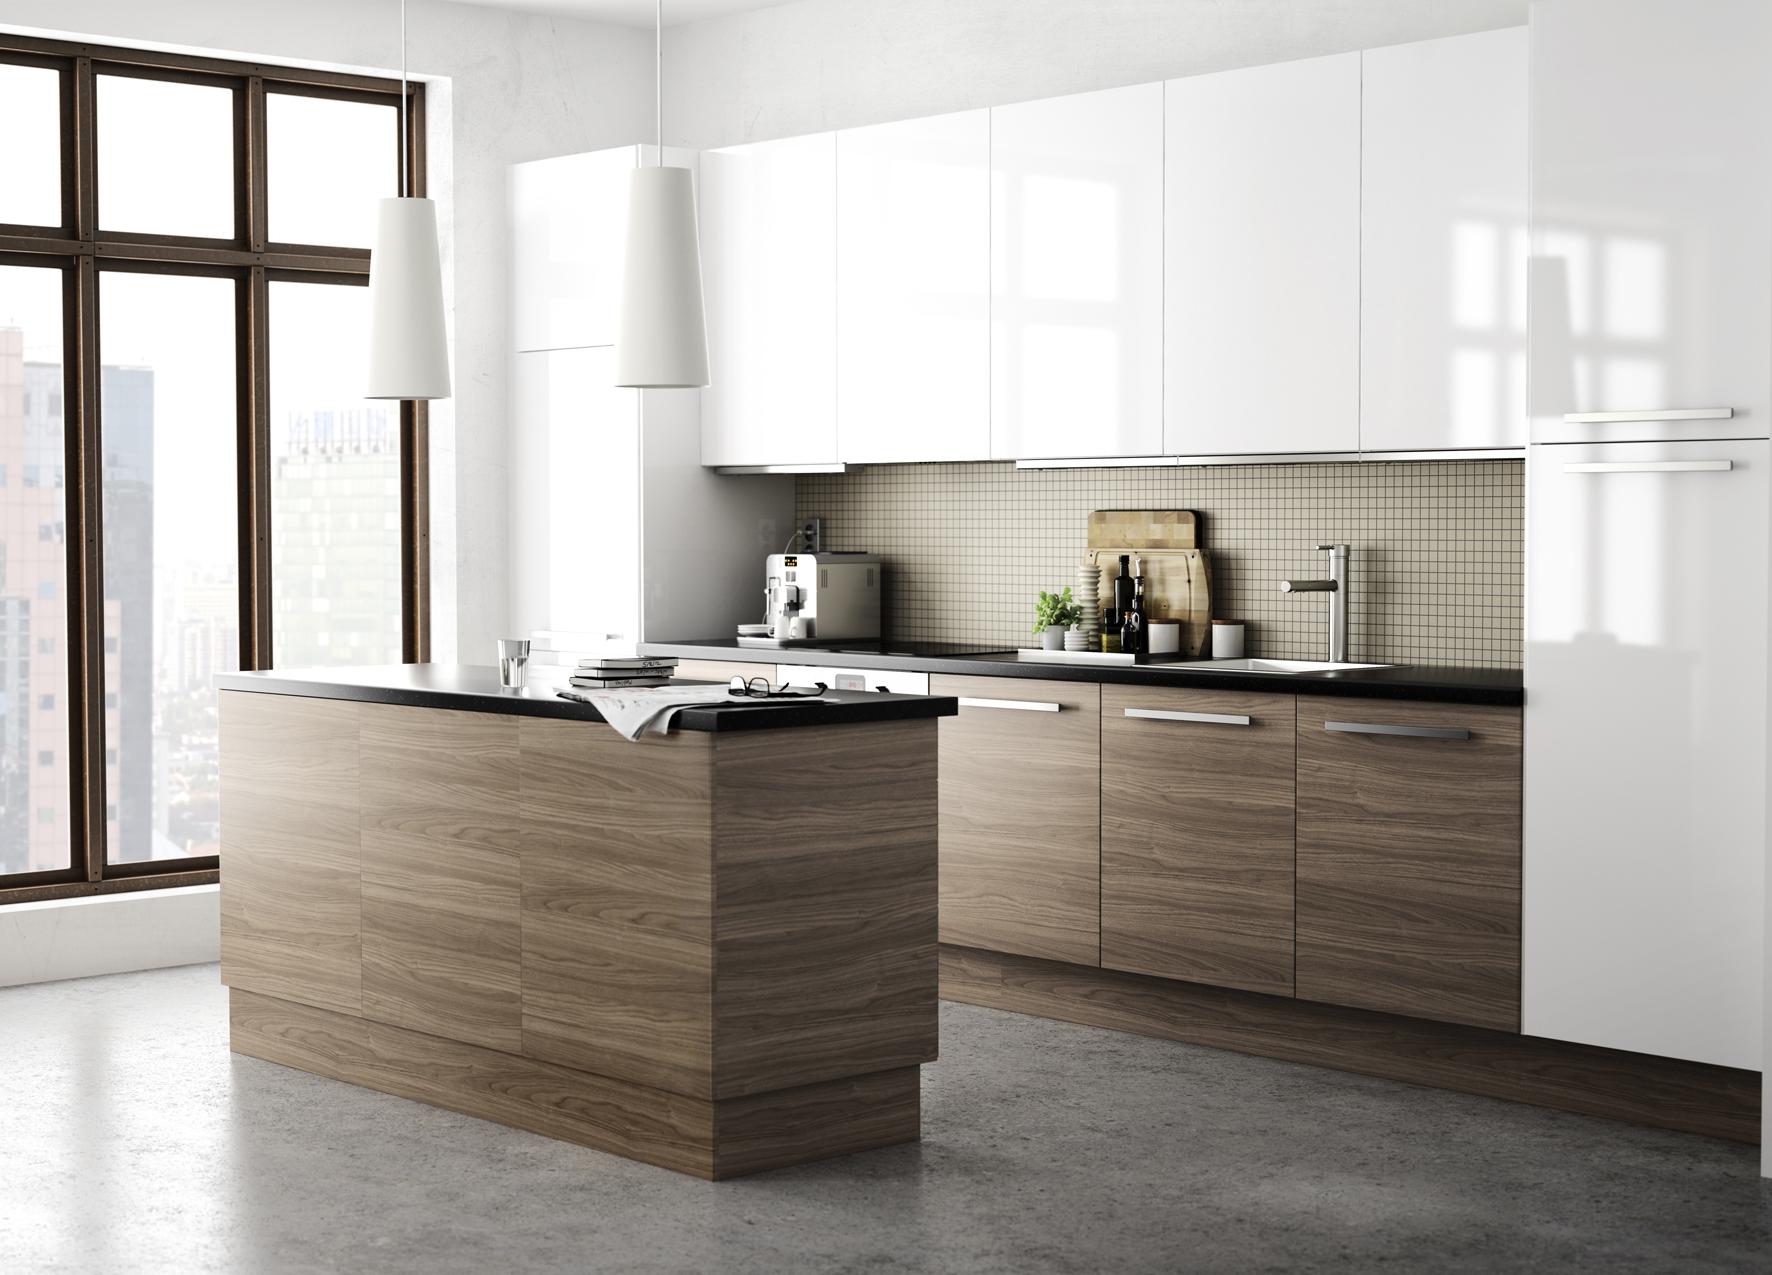 Ikea Nieuwe Keuken Metod : 2014 IKEA Keukens